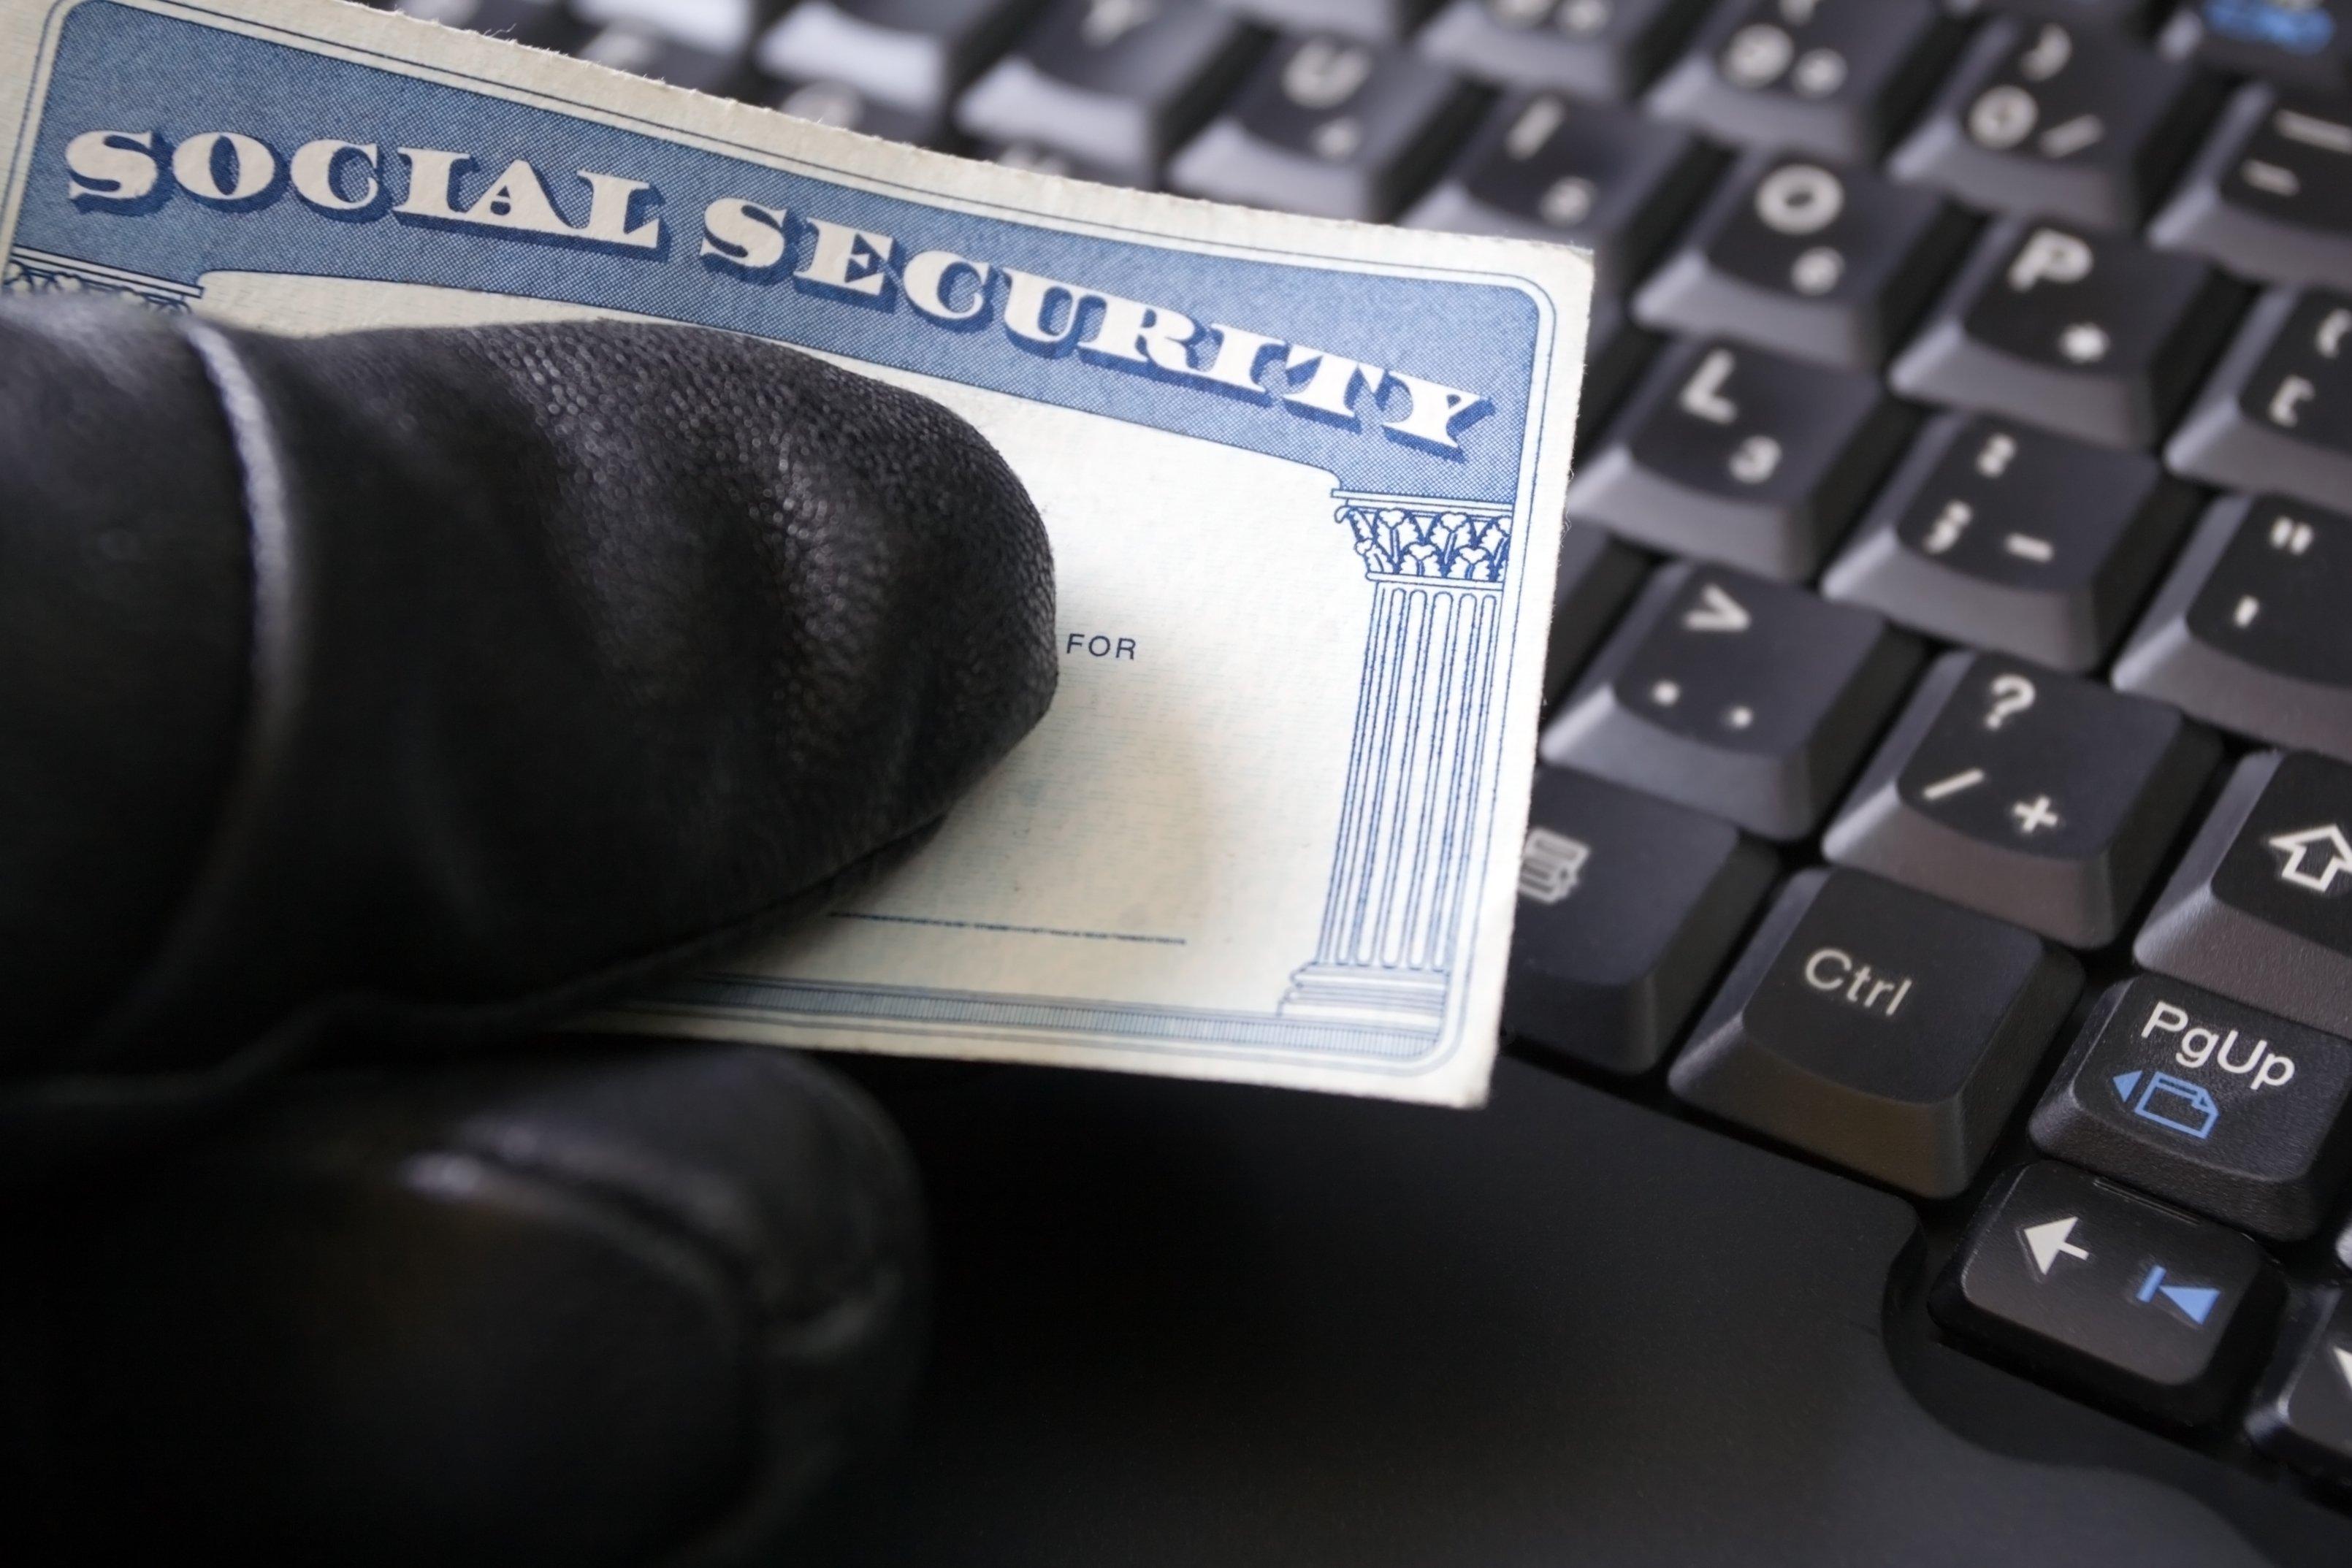 Social security identity thief